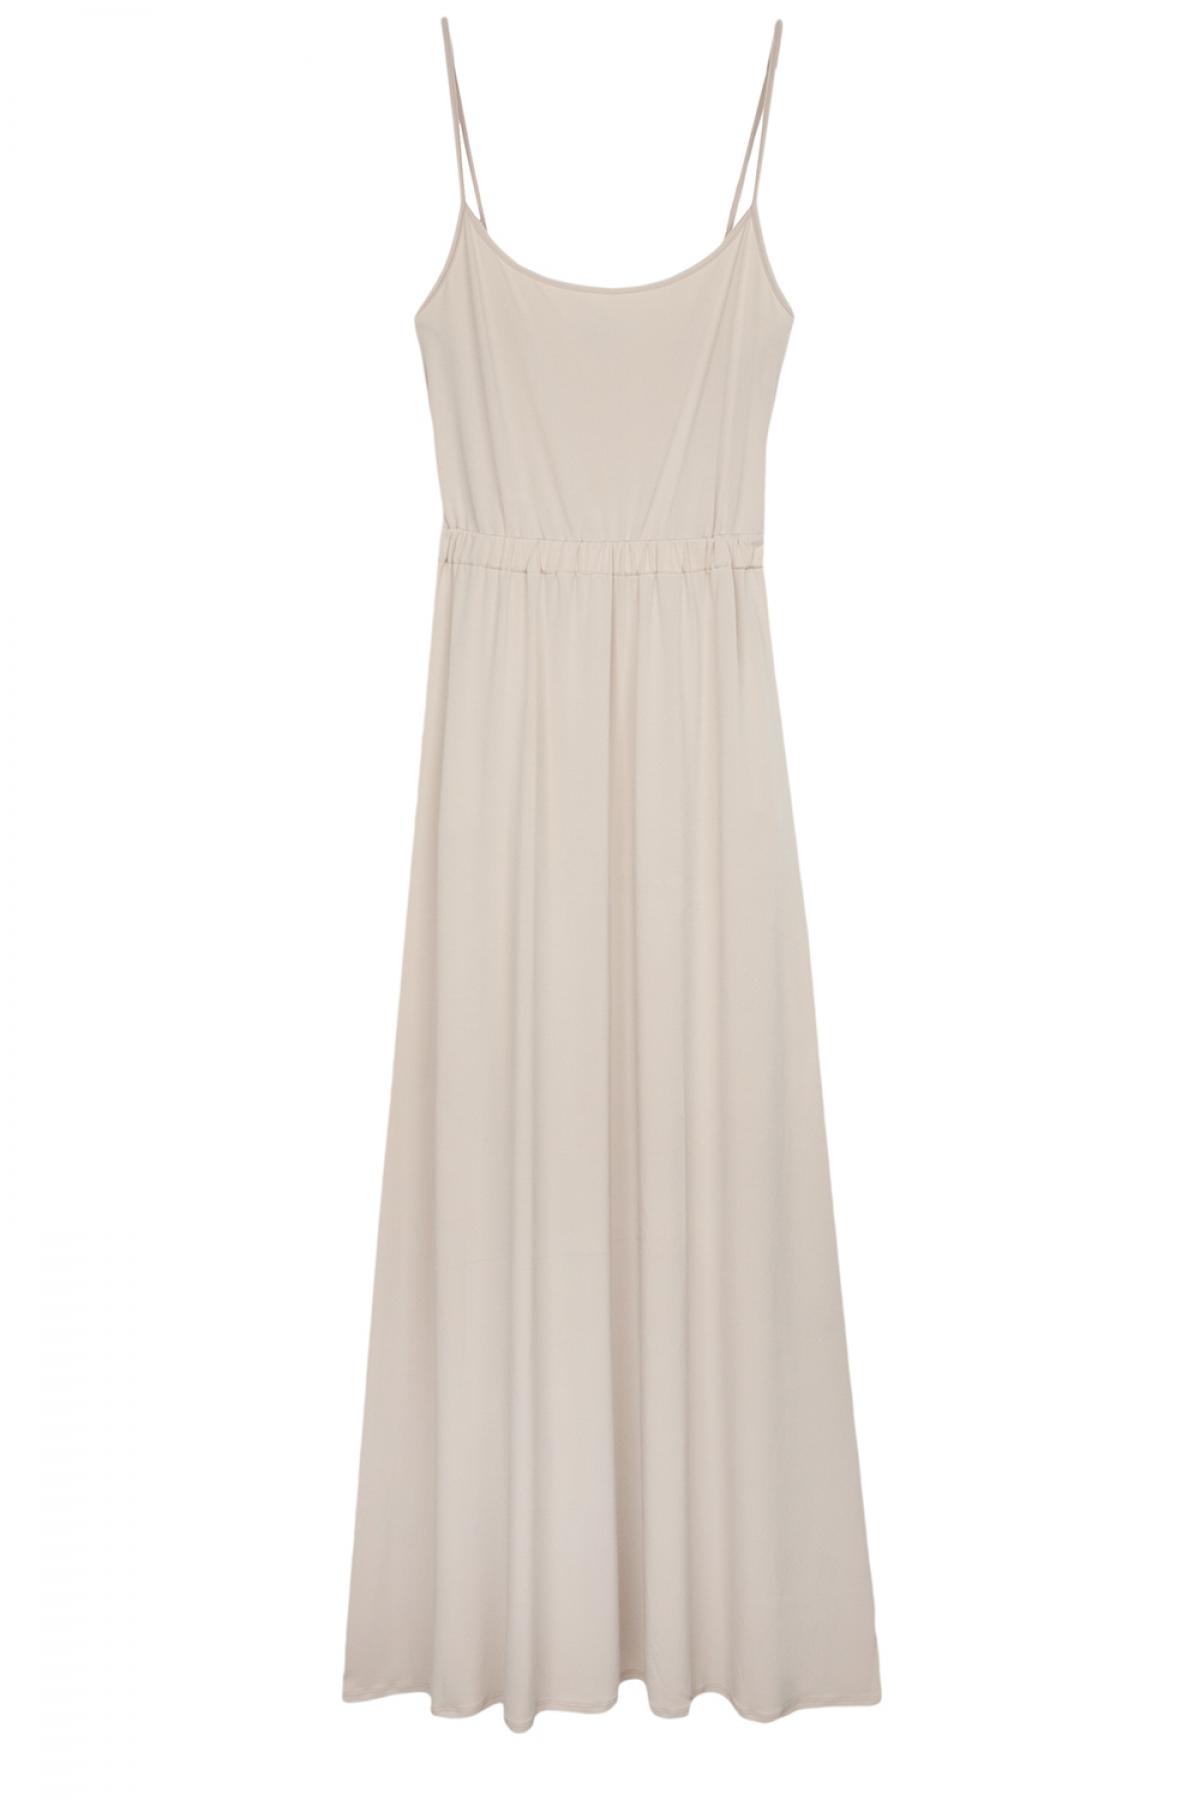 Beige Maxi Dress - Fashionnoiz